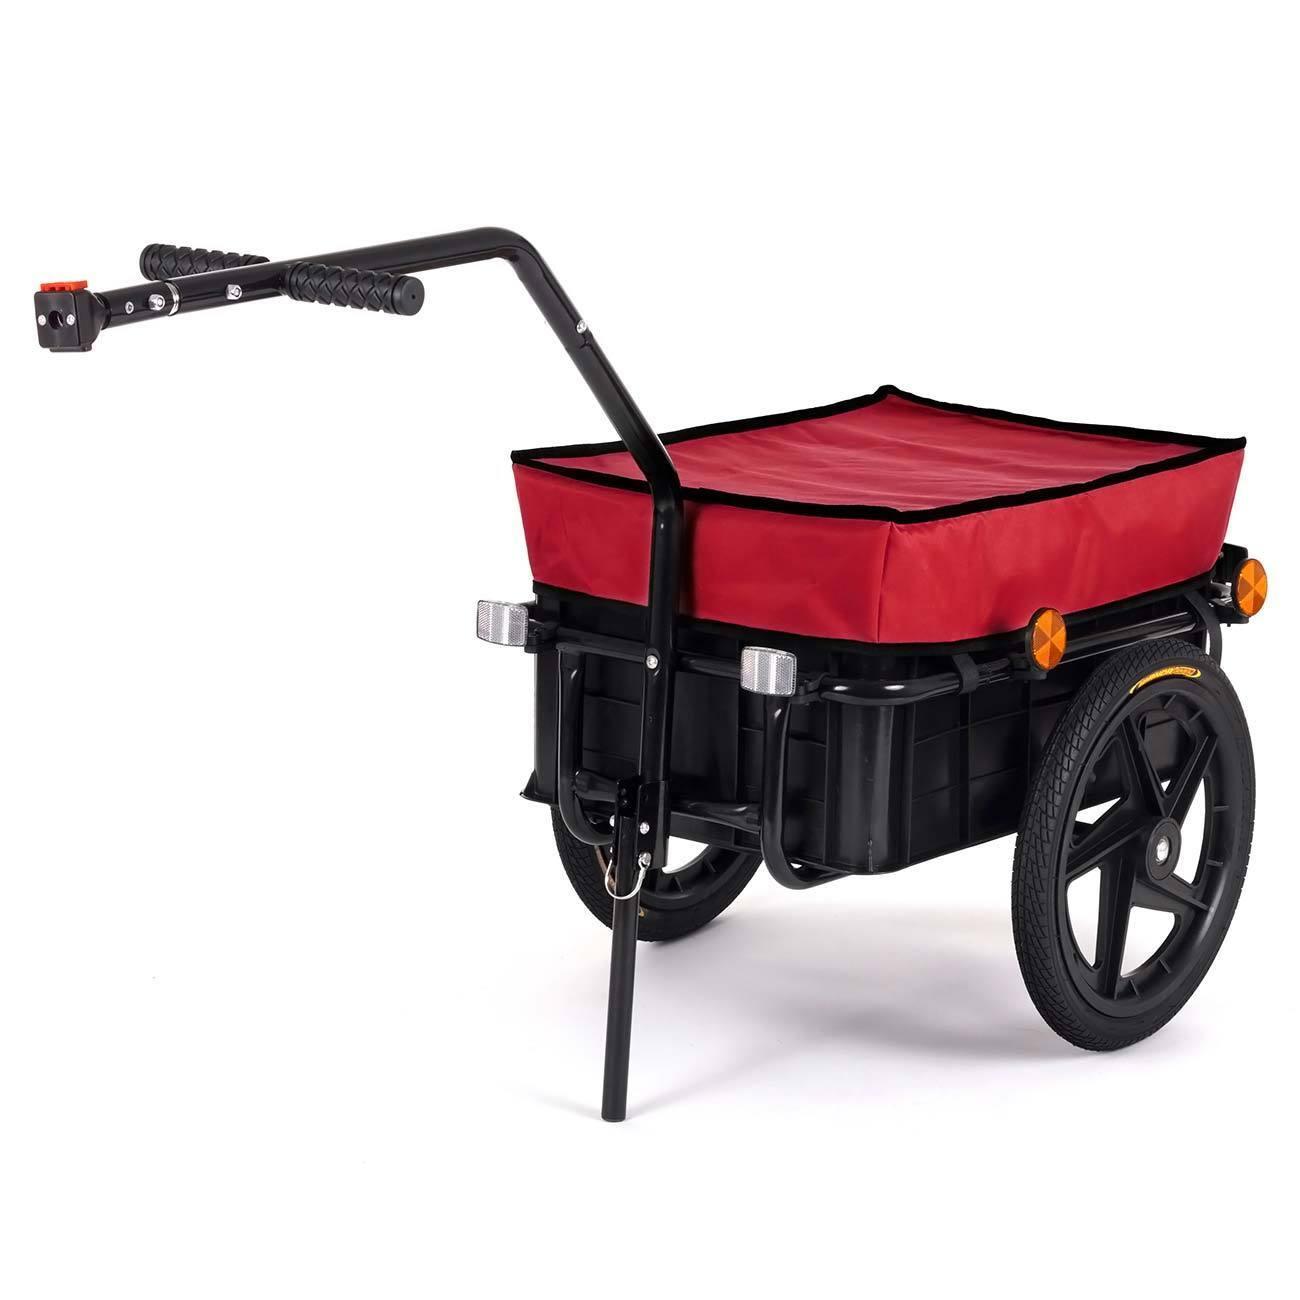 Remolque para Bici Bicicleta Cesta extraible Rueda Neumaticos Carga 60 kg   70L